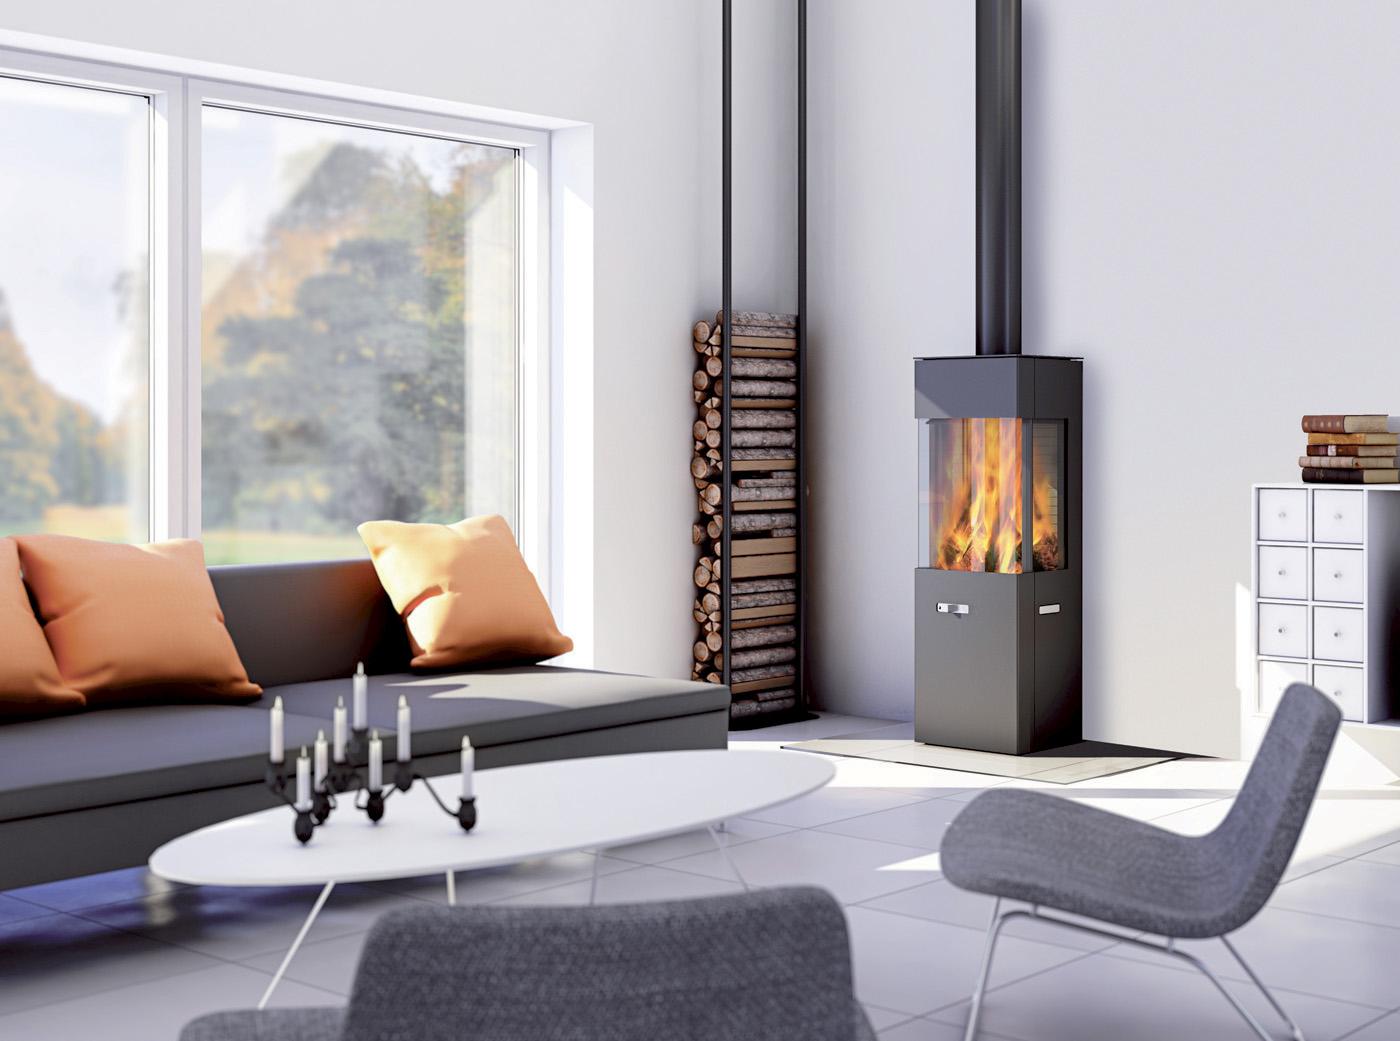 po les attika la culture du feu les performances et le design. Black Bedroom Furniture Sets. Home Design Ideas